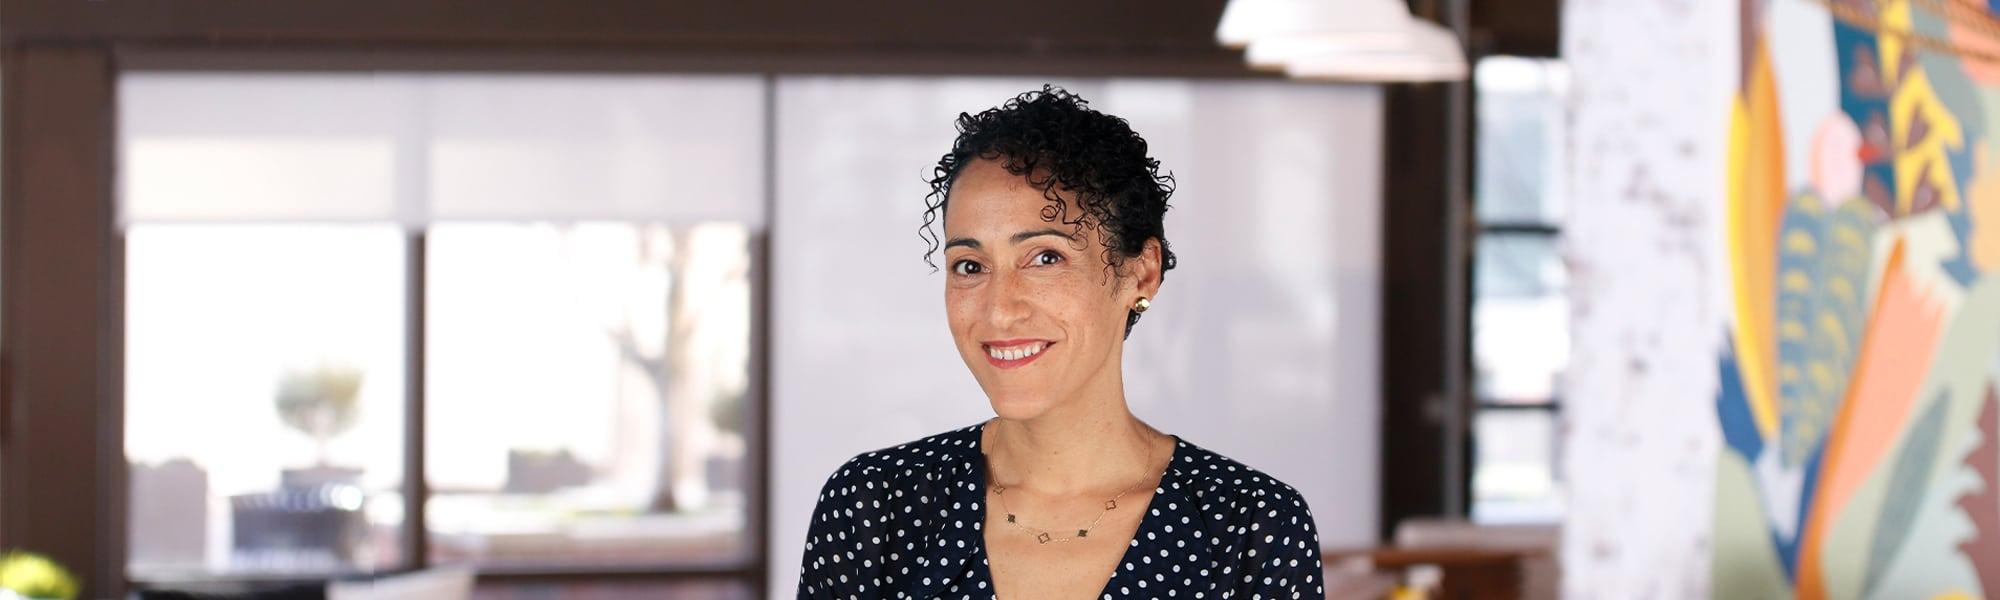 Streetsense Acquires Internationally Renowned Retail Environment Strategy Firm Larisa Ortiz Associates